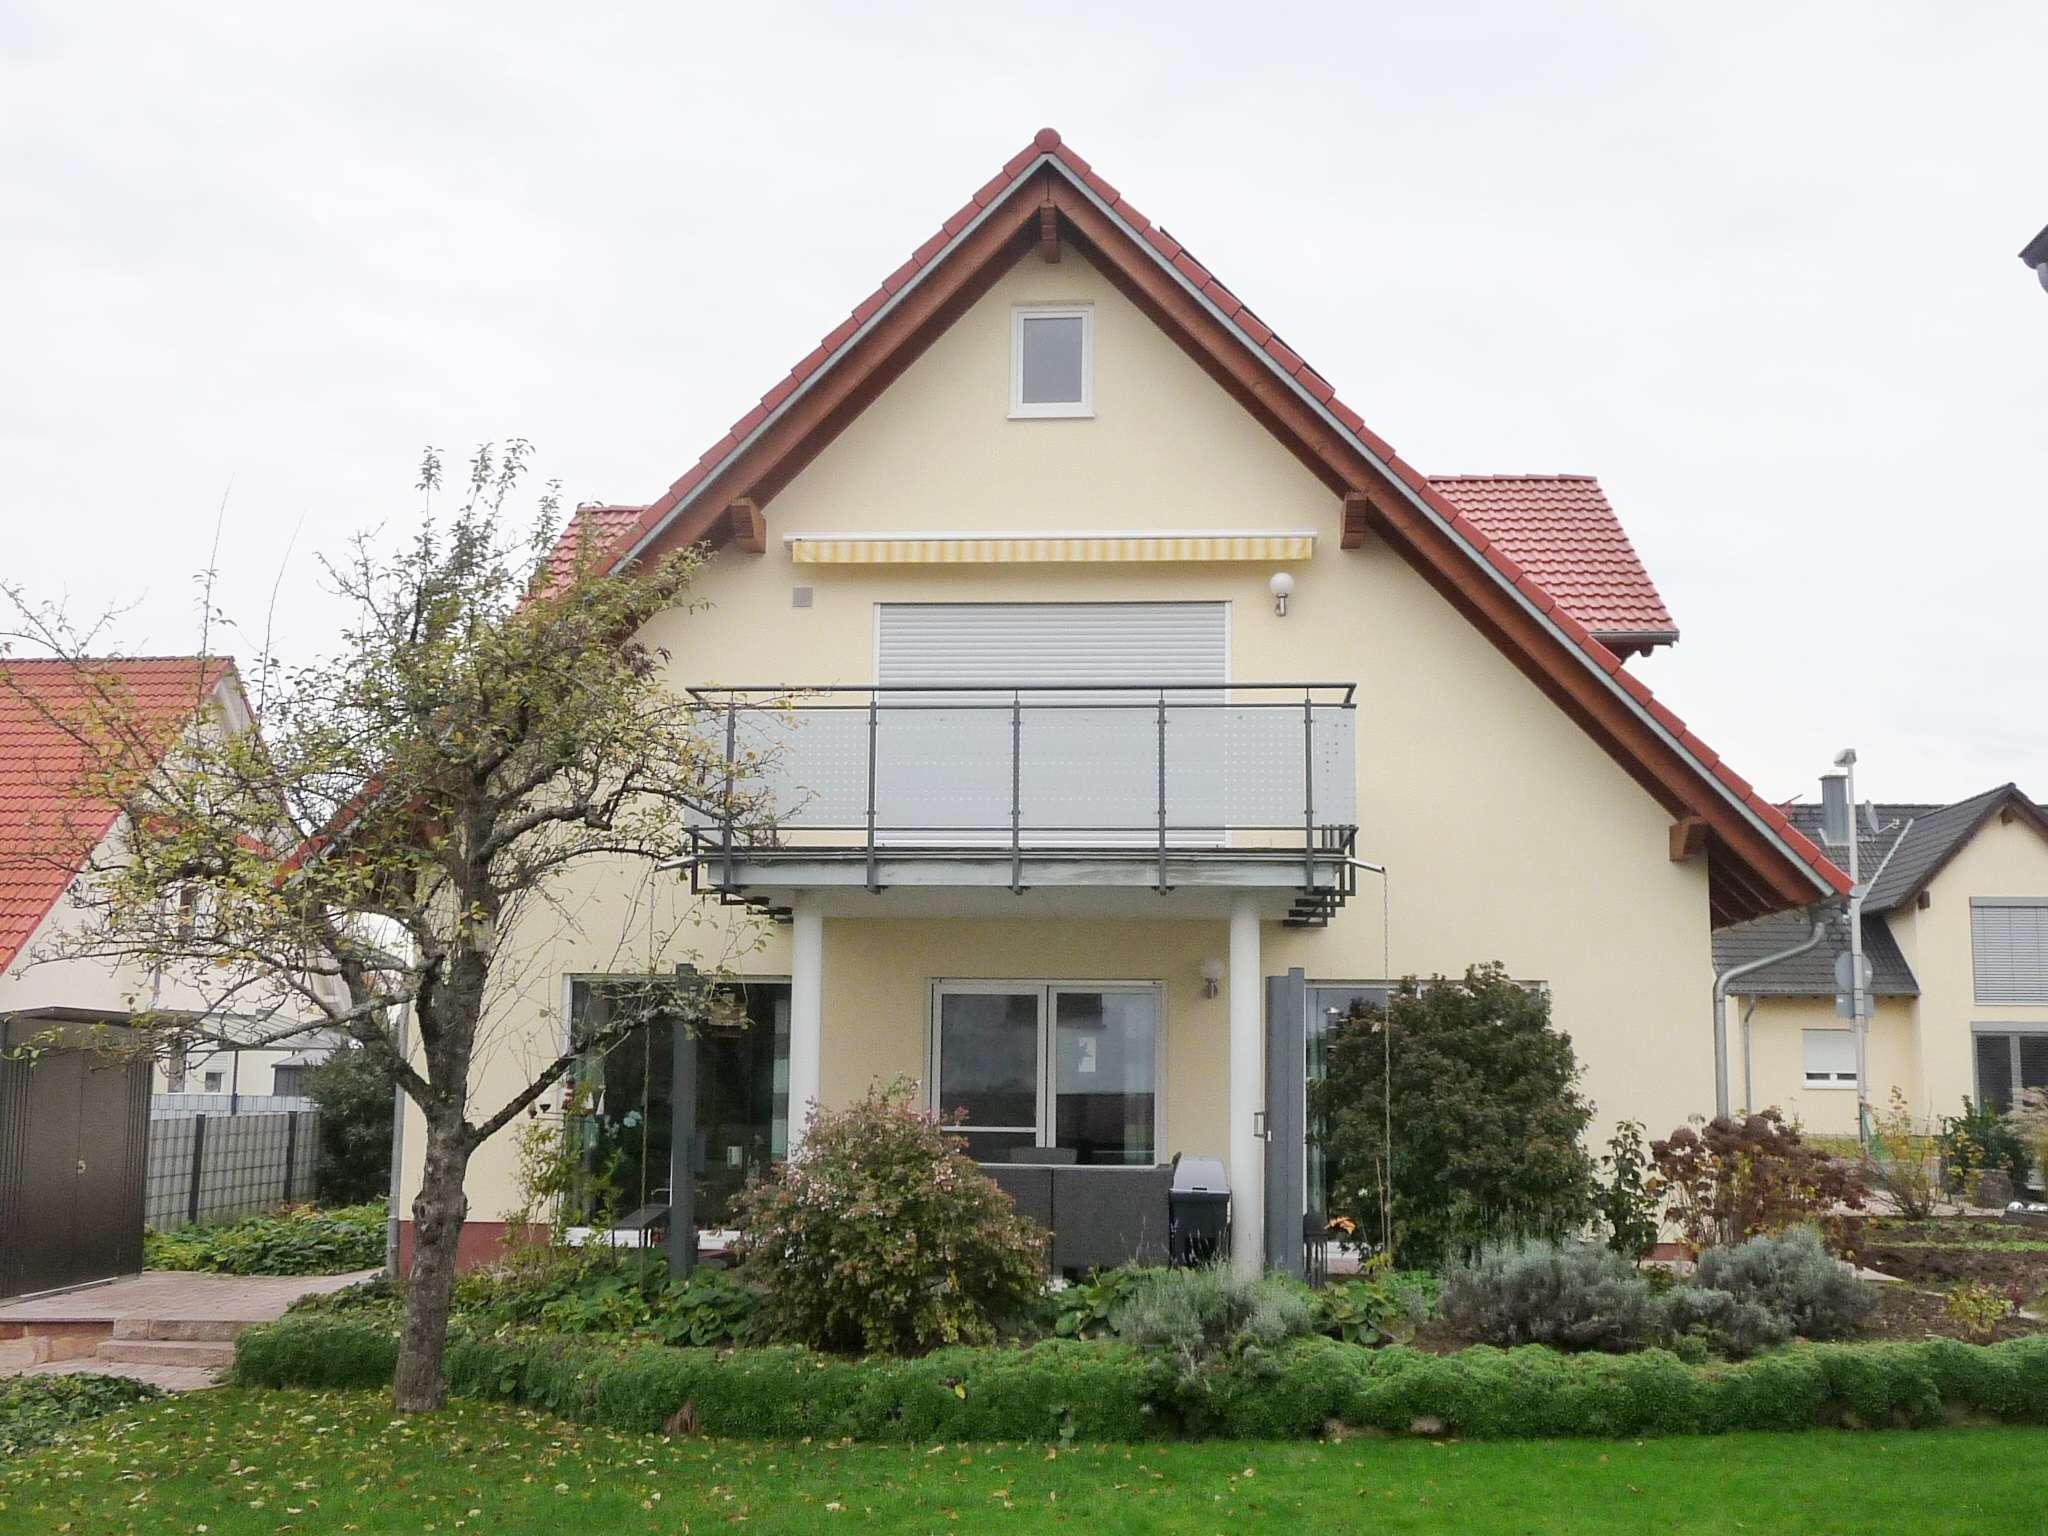 GANESHA-IMMOBILIEN...komfortable Dachgeschoss Wohnung zu vermieten ! in Großostheim